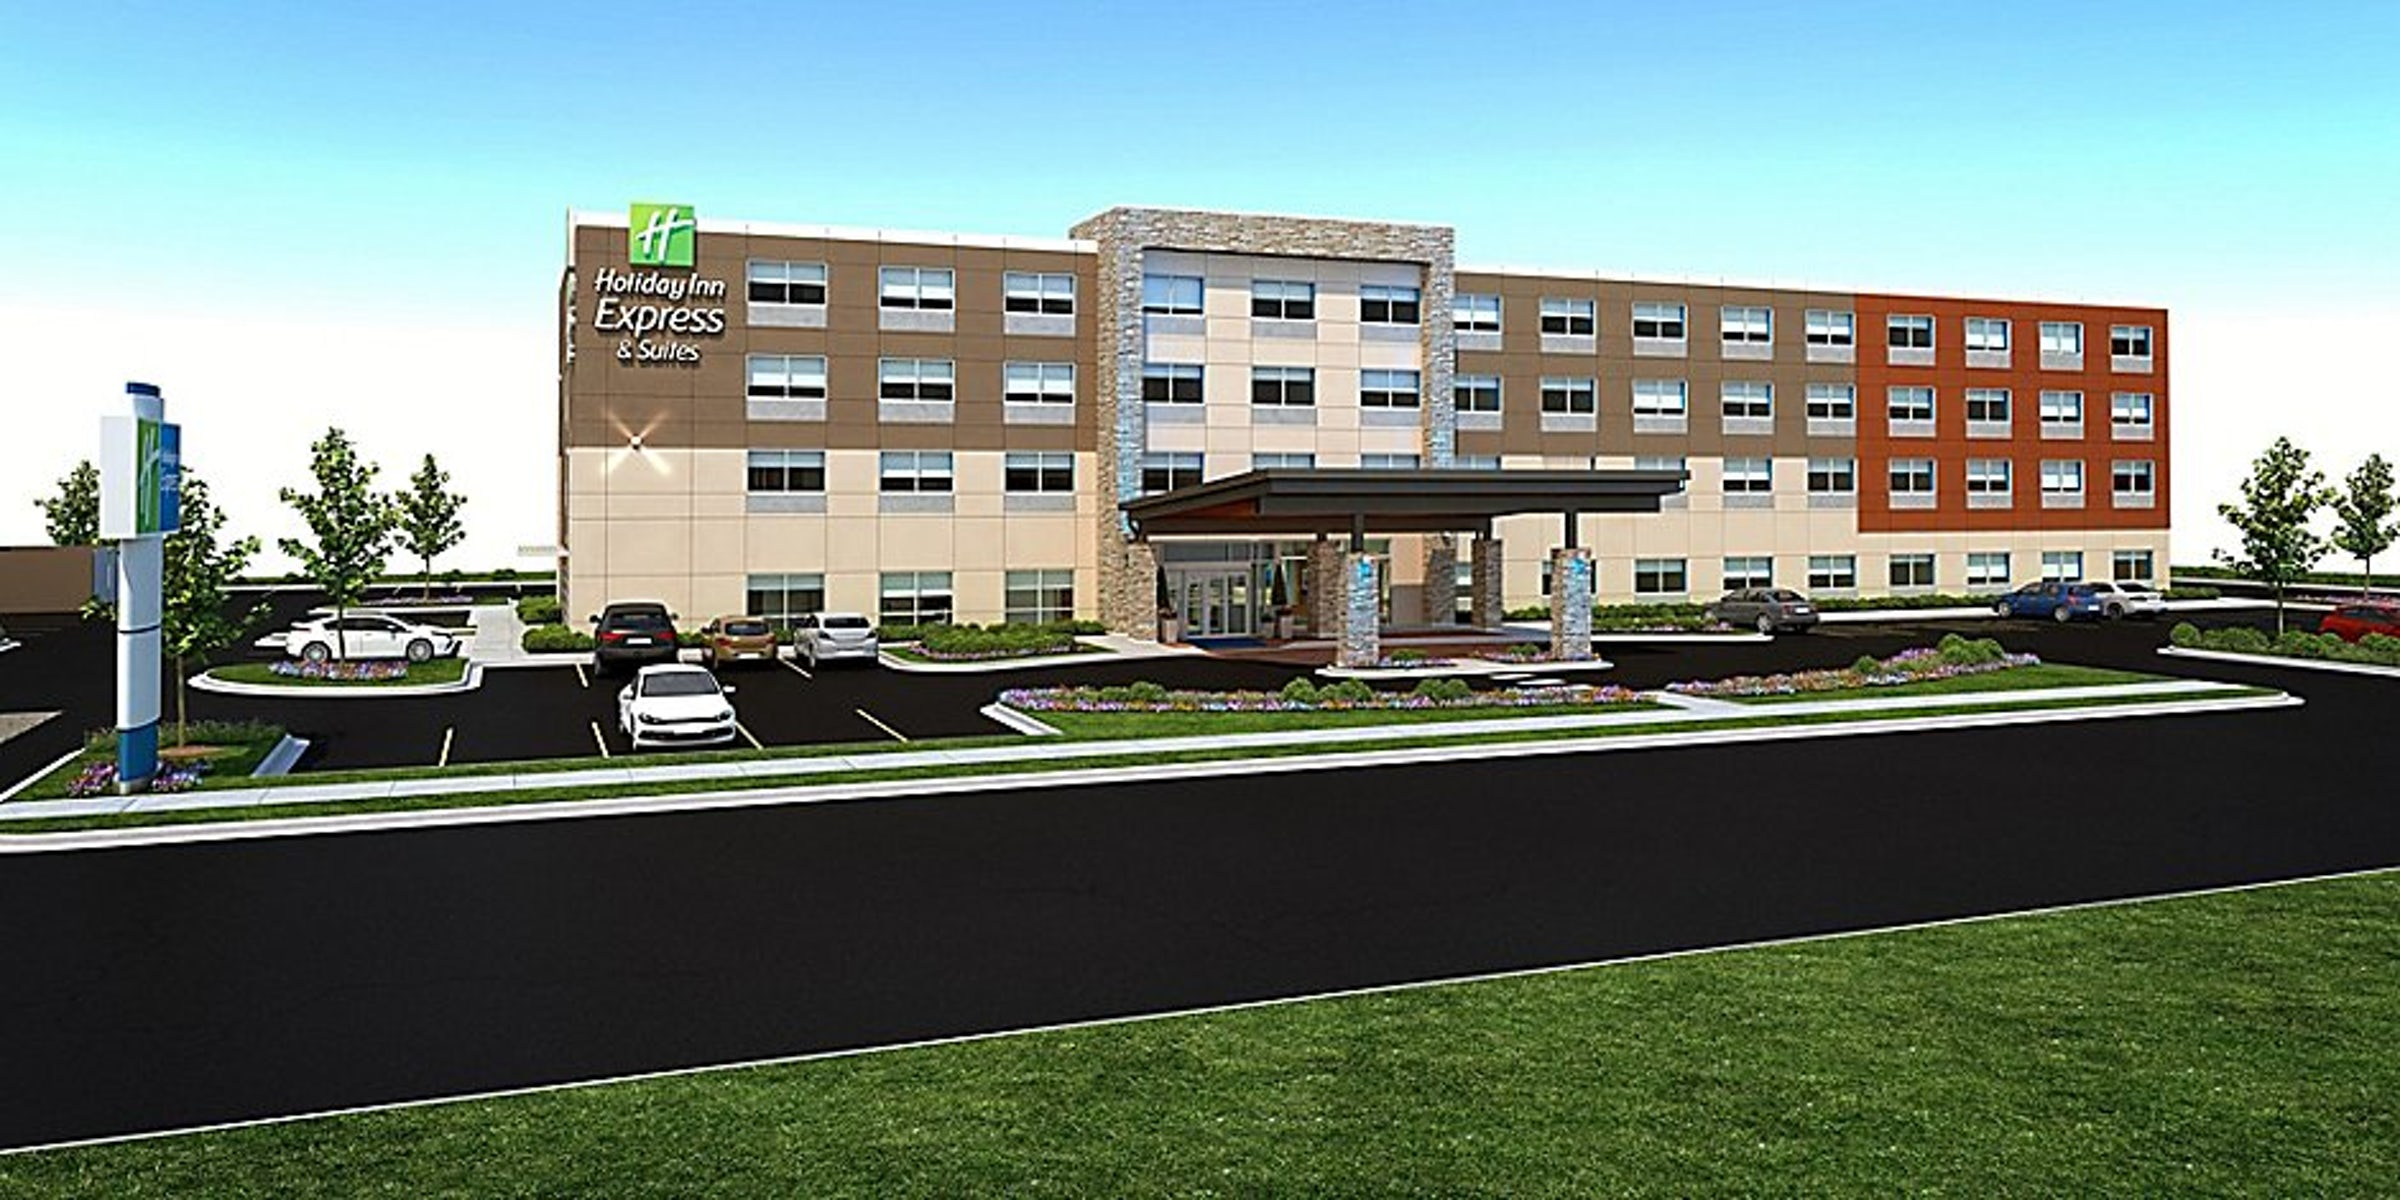 Holiday Inn Express & Suites Dallas Northeast - Arboretum in Beyond Dallas